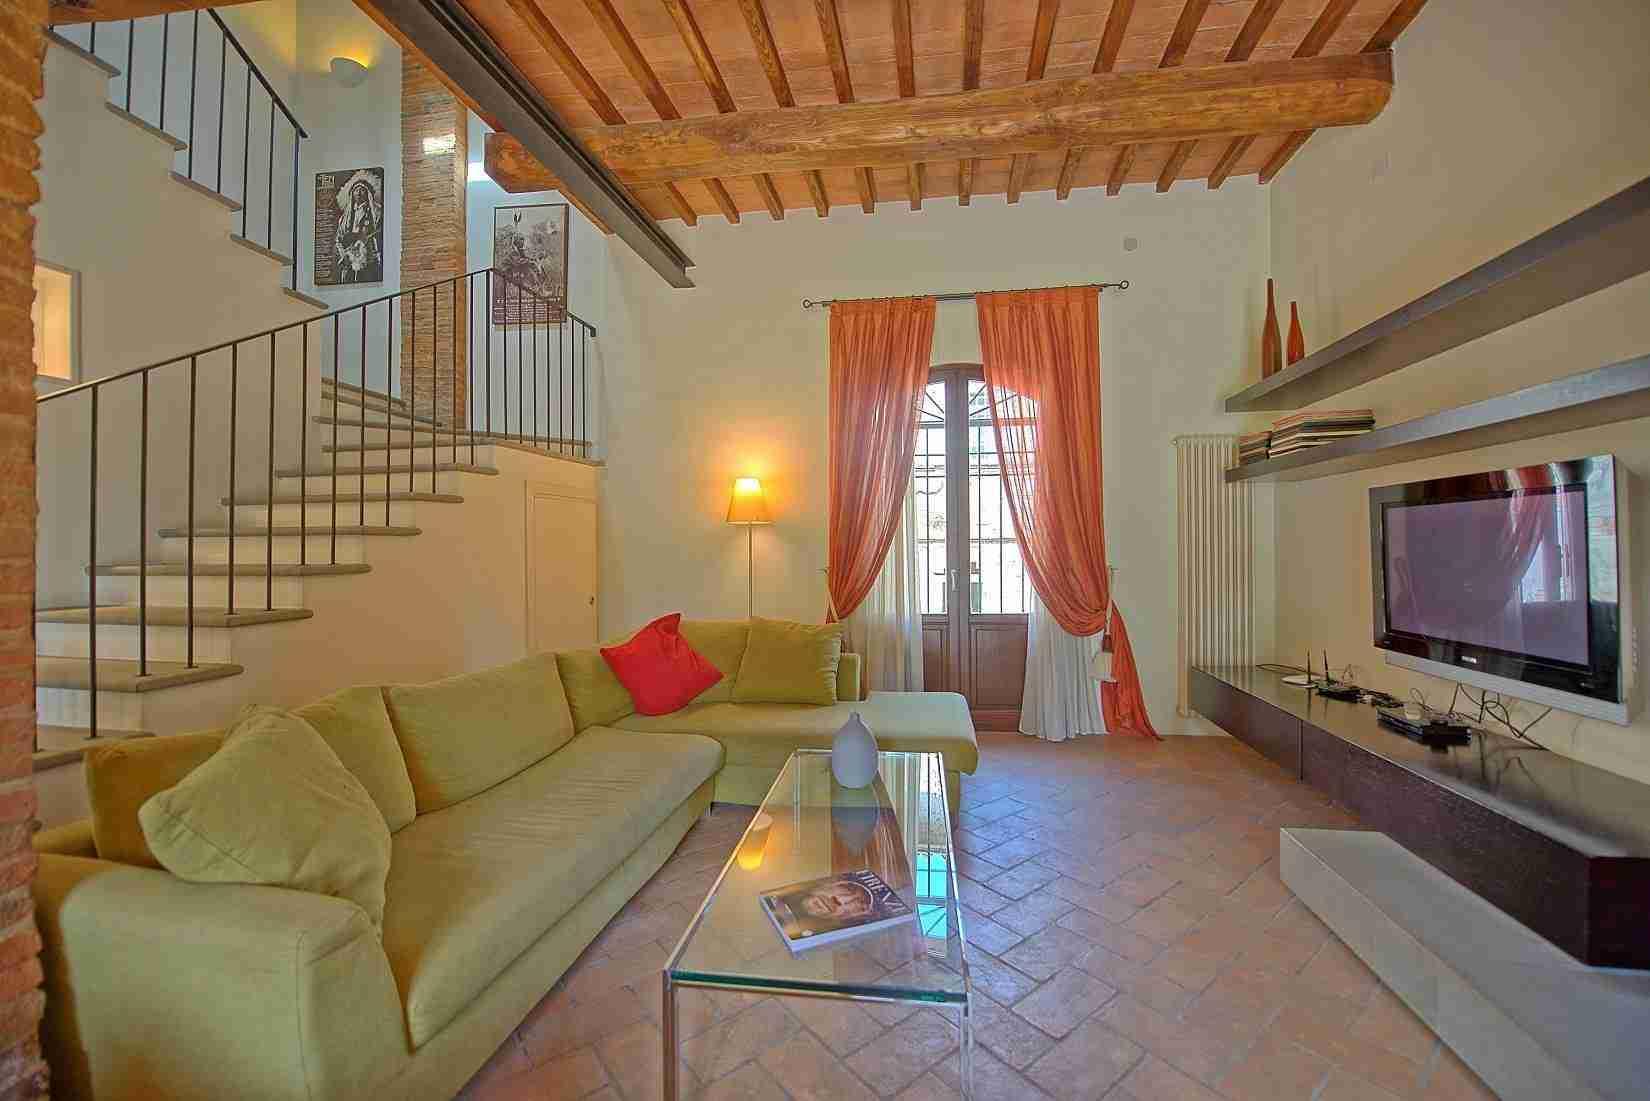 6 Ranieri living room